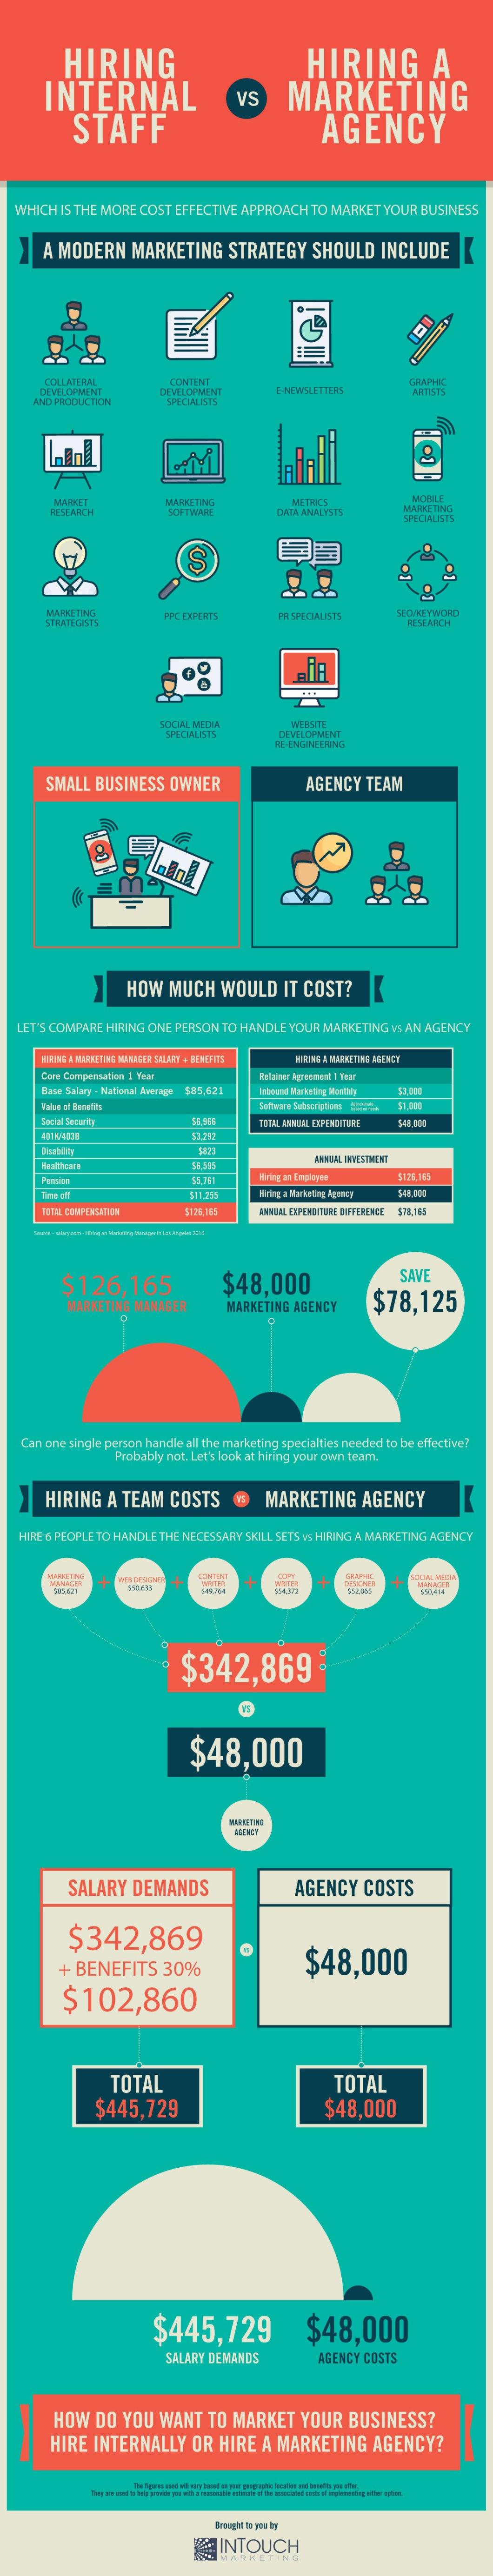 http://blog.intouch-marketing.com/hubfs/Infographics/Hiring-A-Marketing-Firm-vs-Hiring-Internal-Staff-Infographic